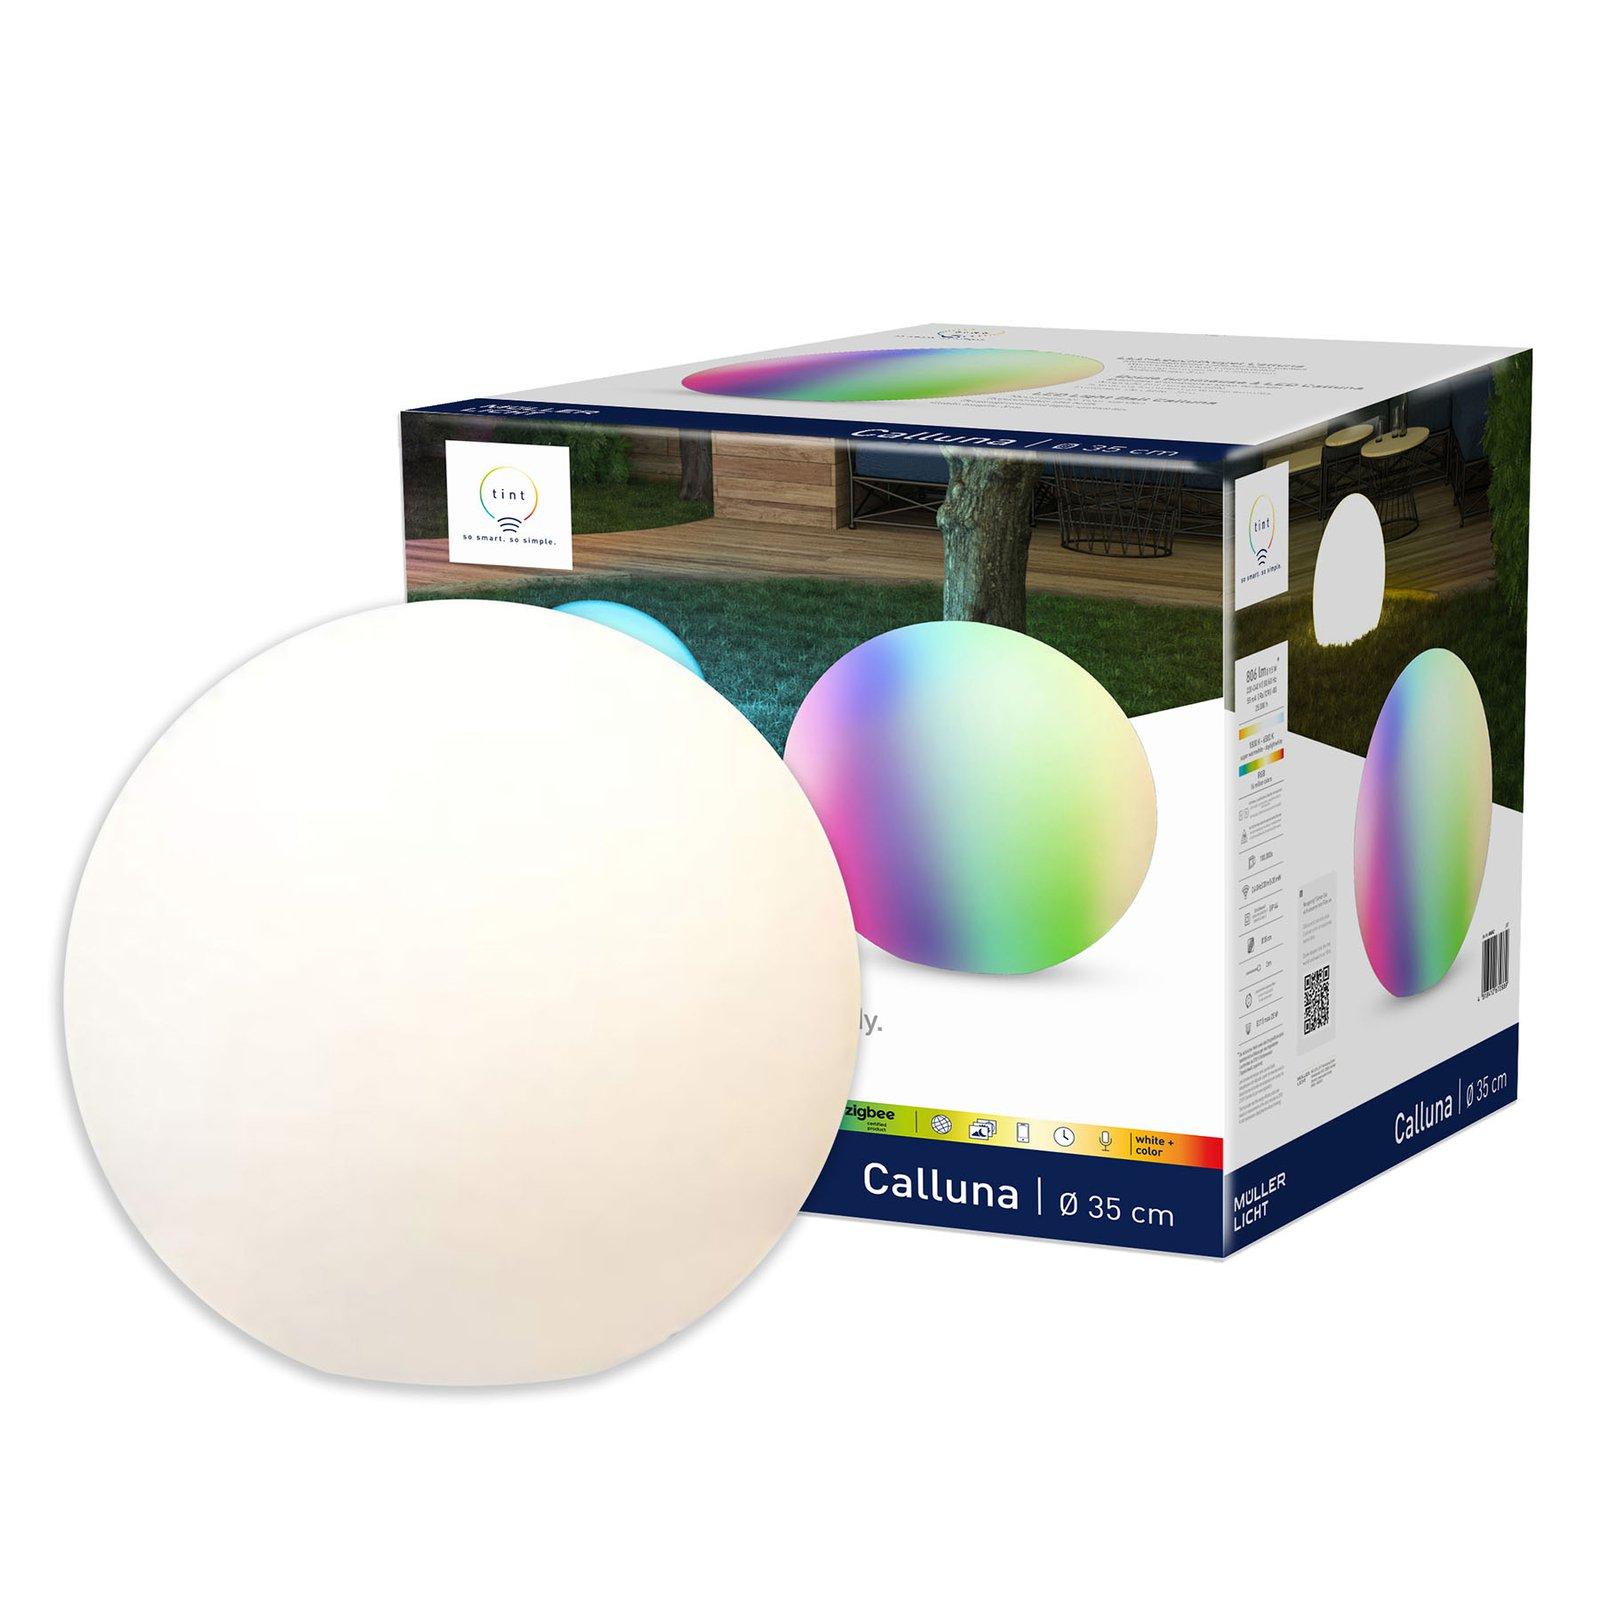 Müller Licht tint Calluna LED-lyskule IP44